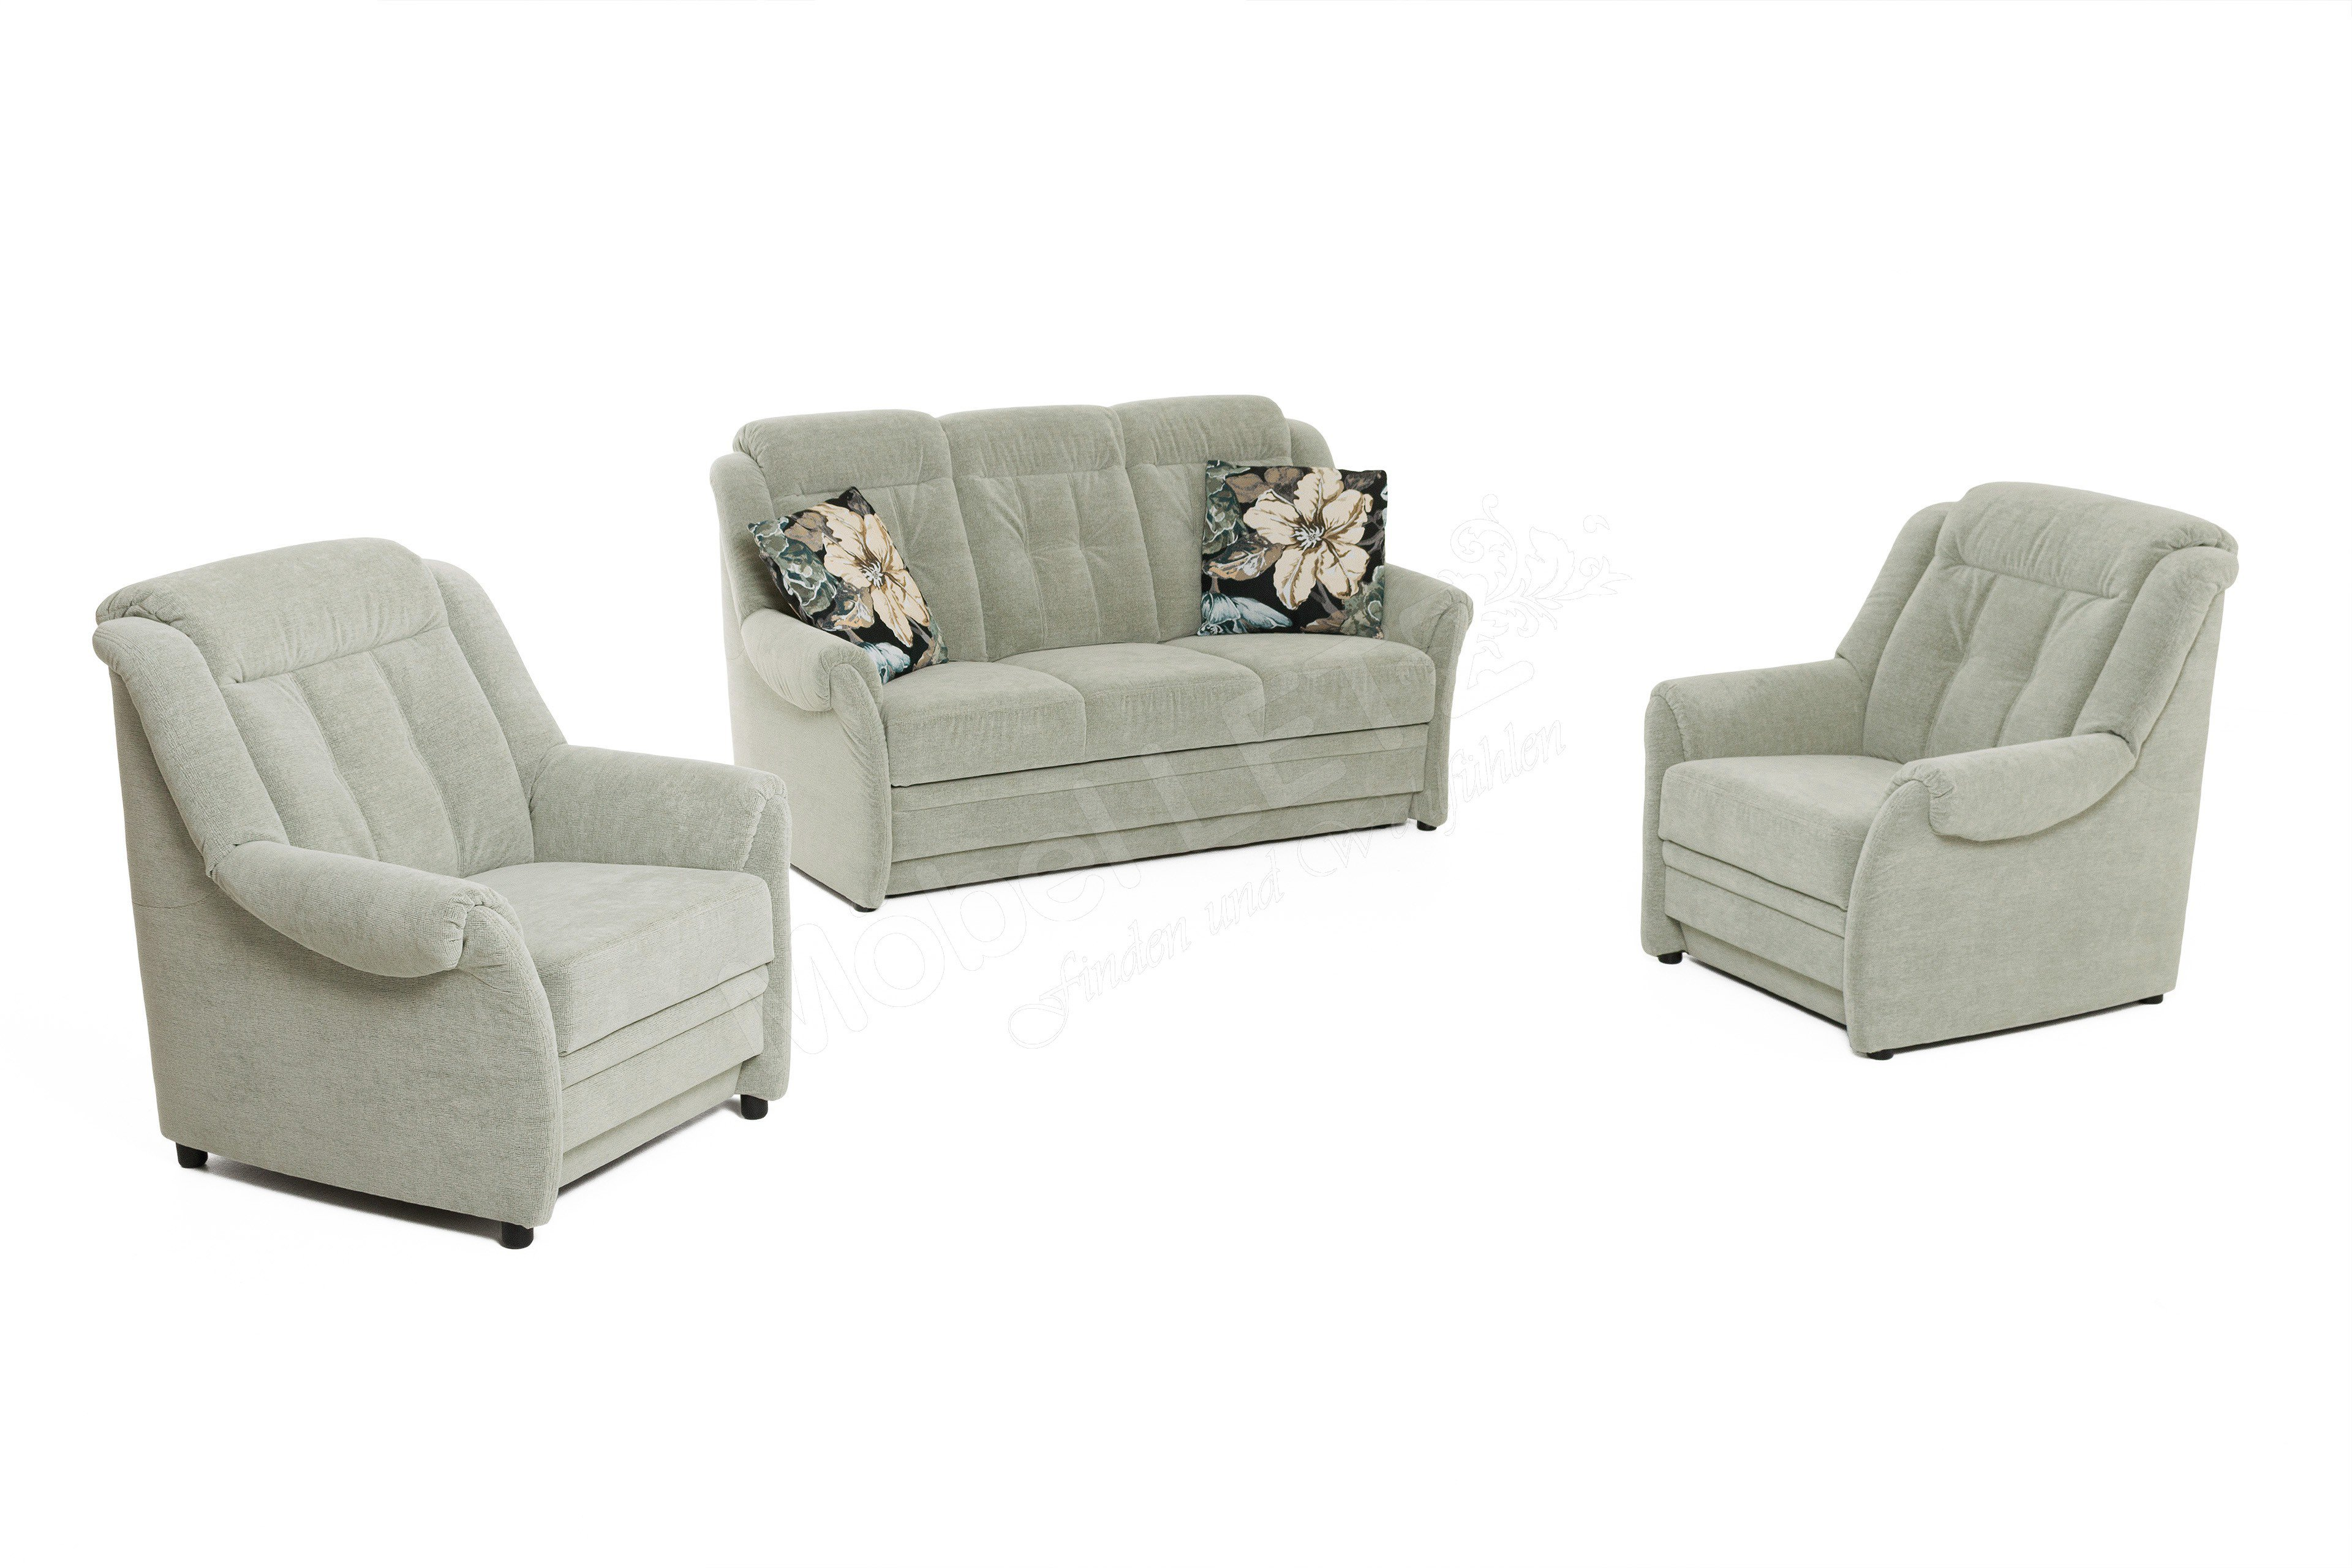 PM Oelsa Andorra Sofagruppe in Mint | Möbel Letz - Ihr Online-Shop